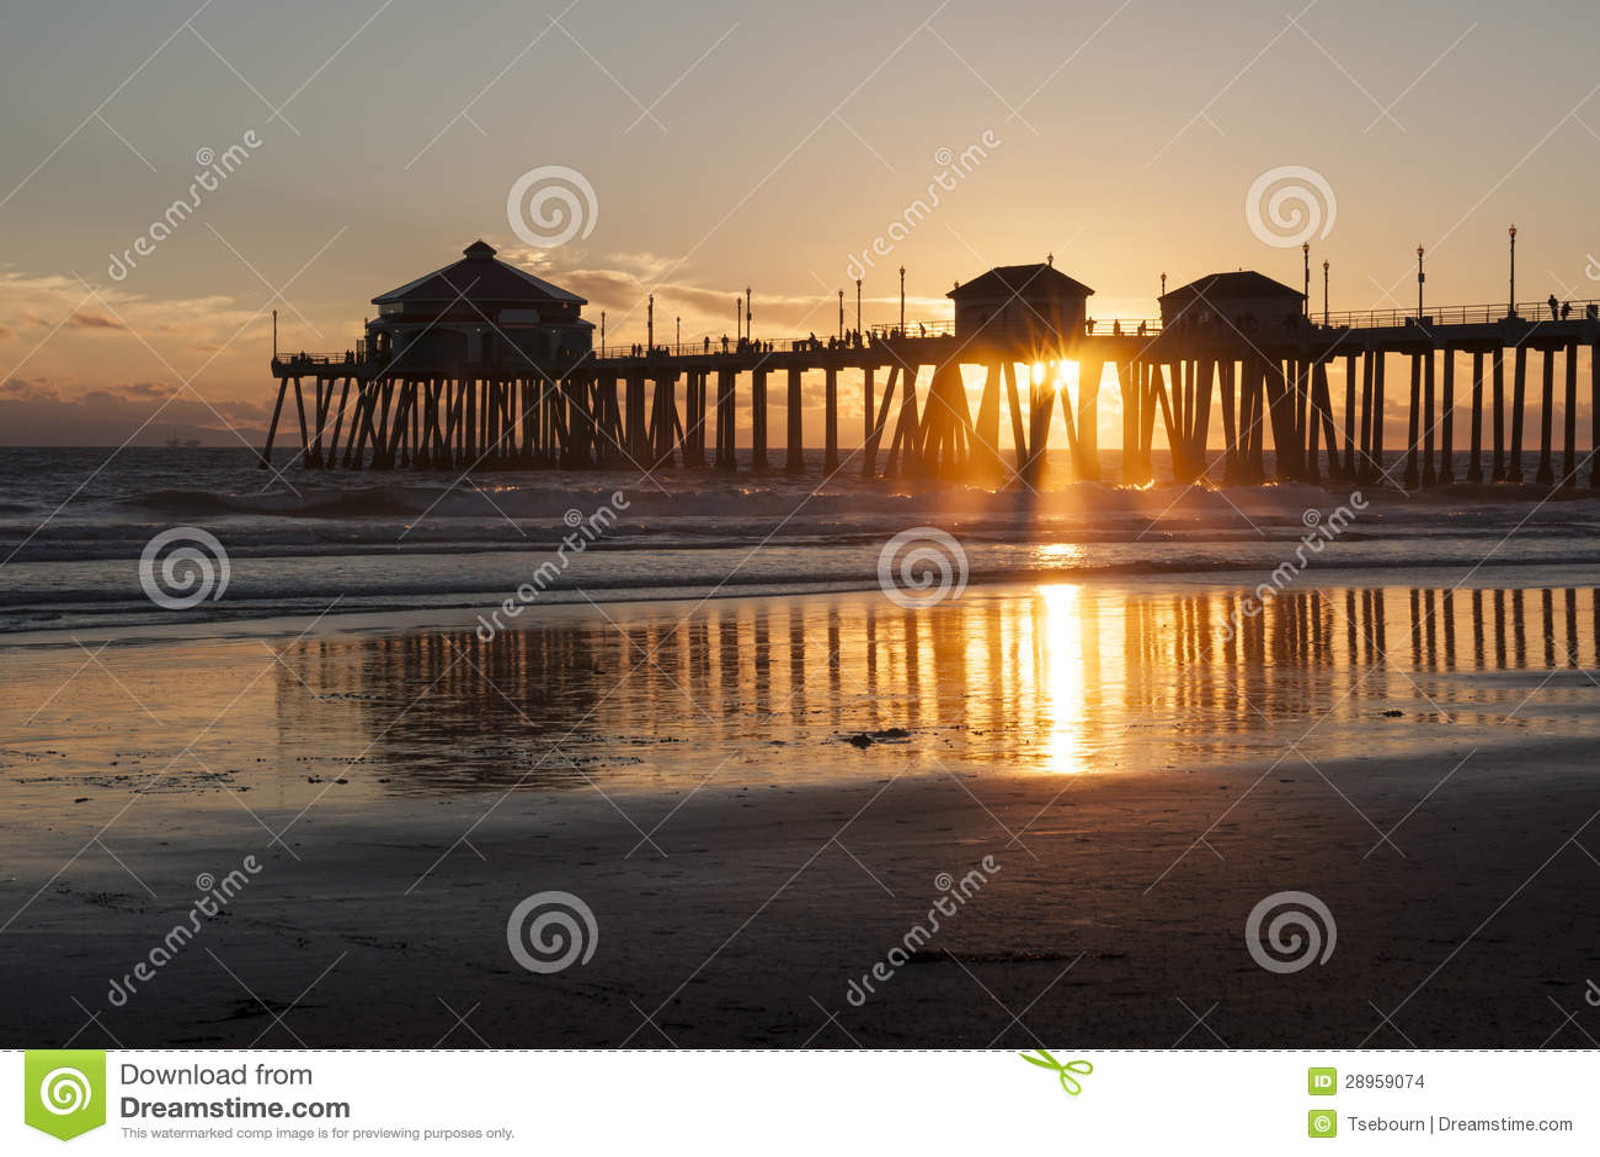 Huntington Beach Pier Sunburst Stock Photo - Image of fishing